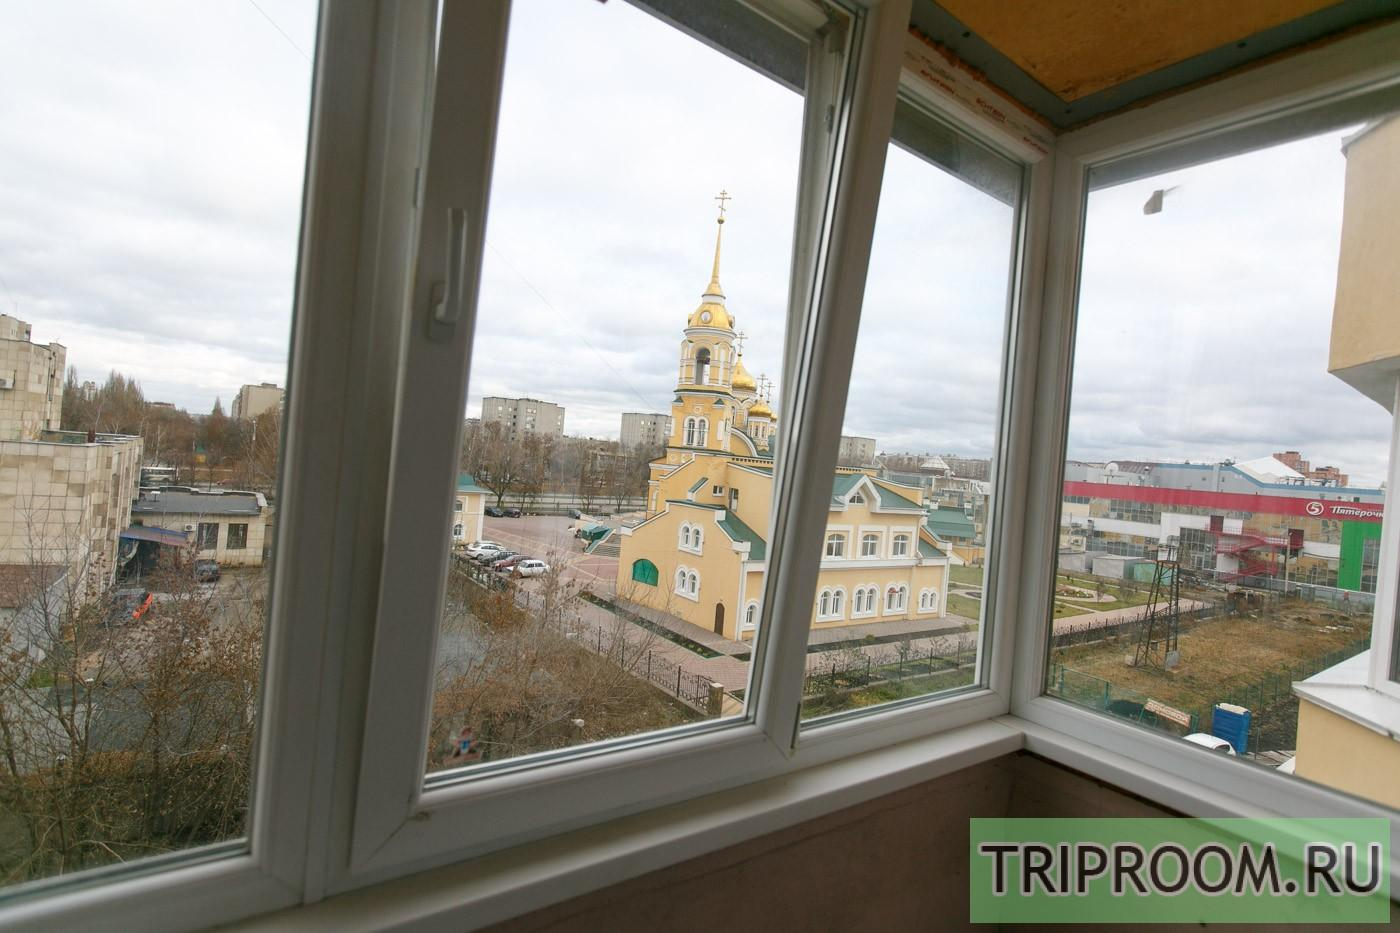 1-комнатная квартира посуточно (вариант № 30979), ул. Петра Смородина улица, фото № 11